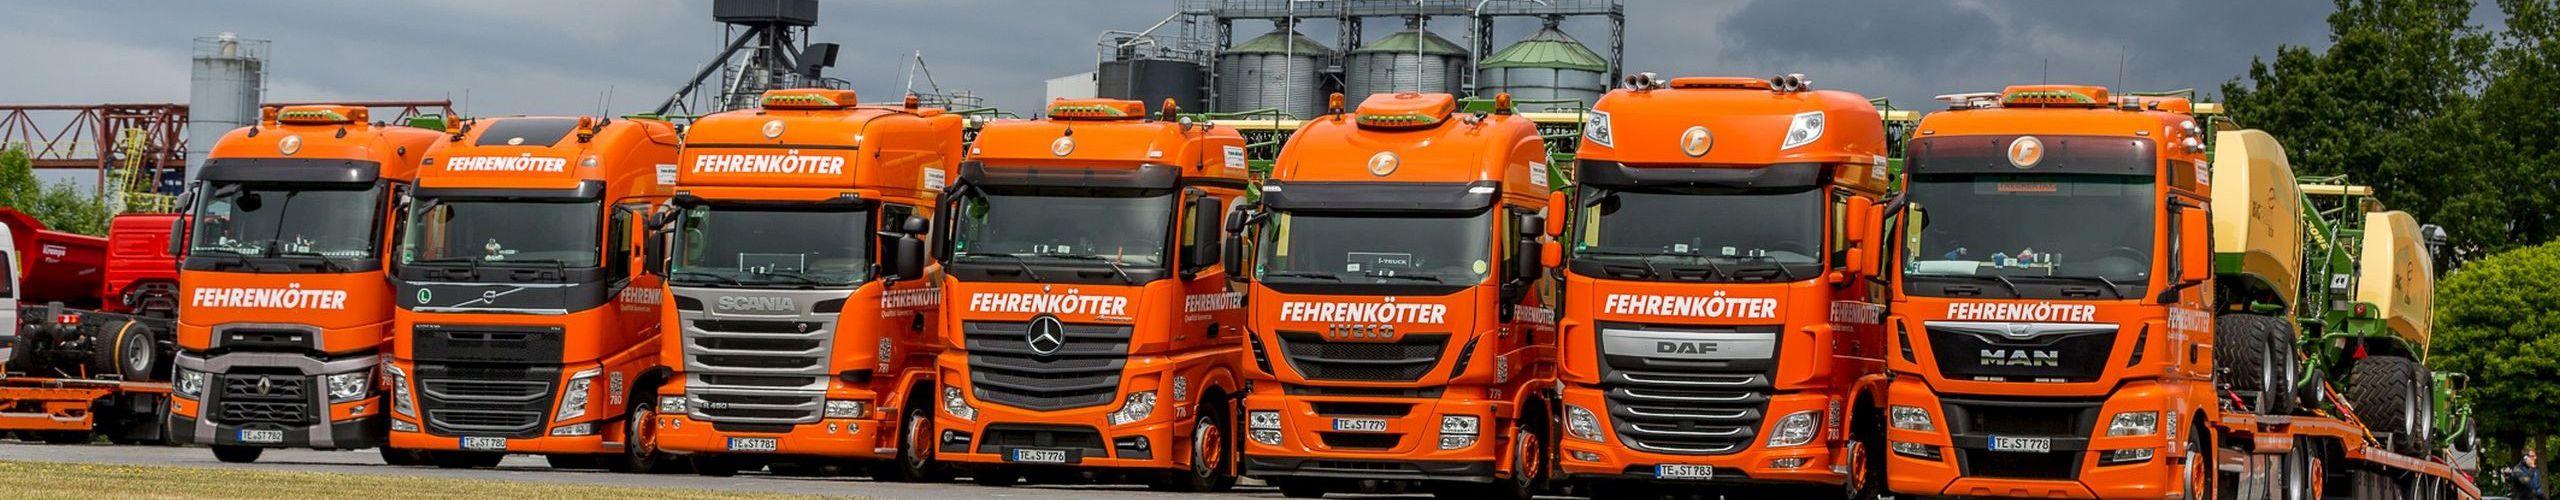 Berühmt Fehrenkötter Transport & Logistik GmbH: Landmaschinen-Transporte @WS_16